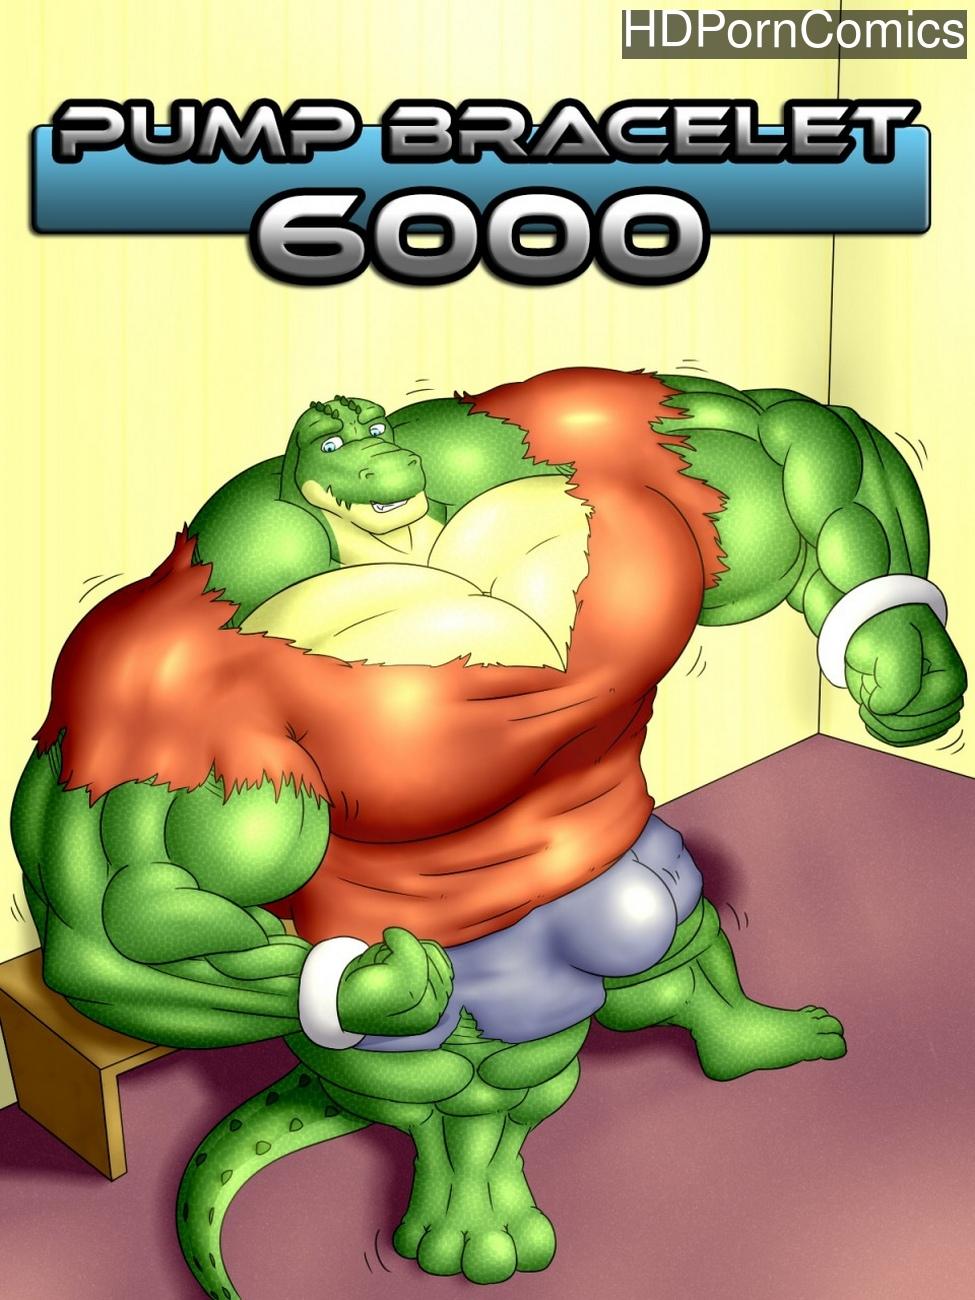 Pump-Bracelet-6000 1 free porn comics